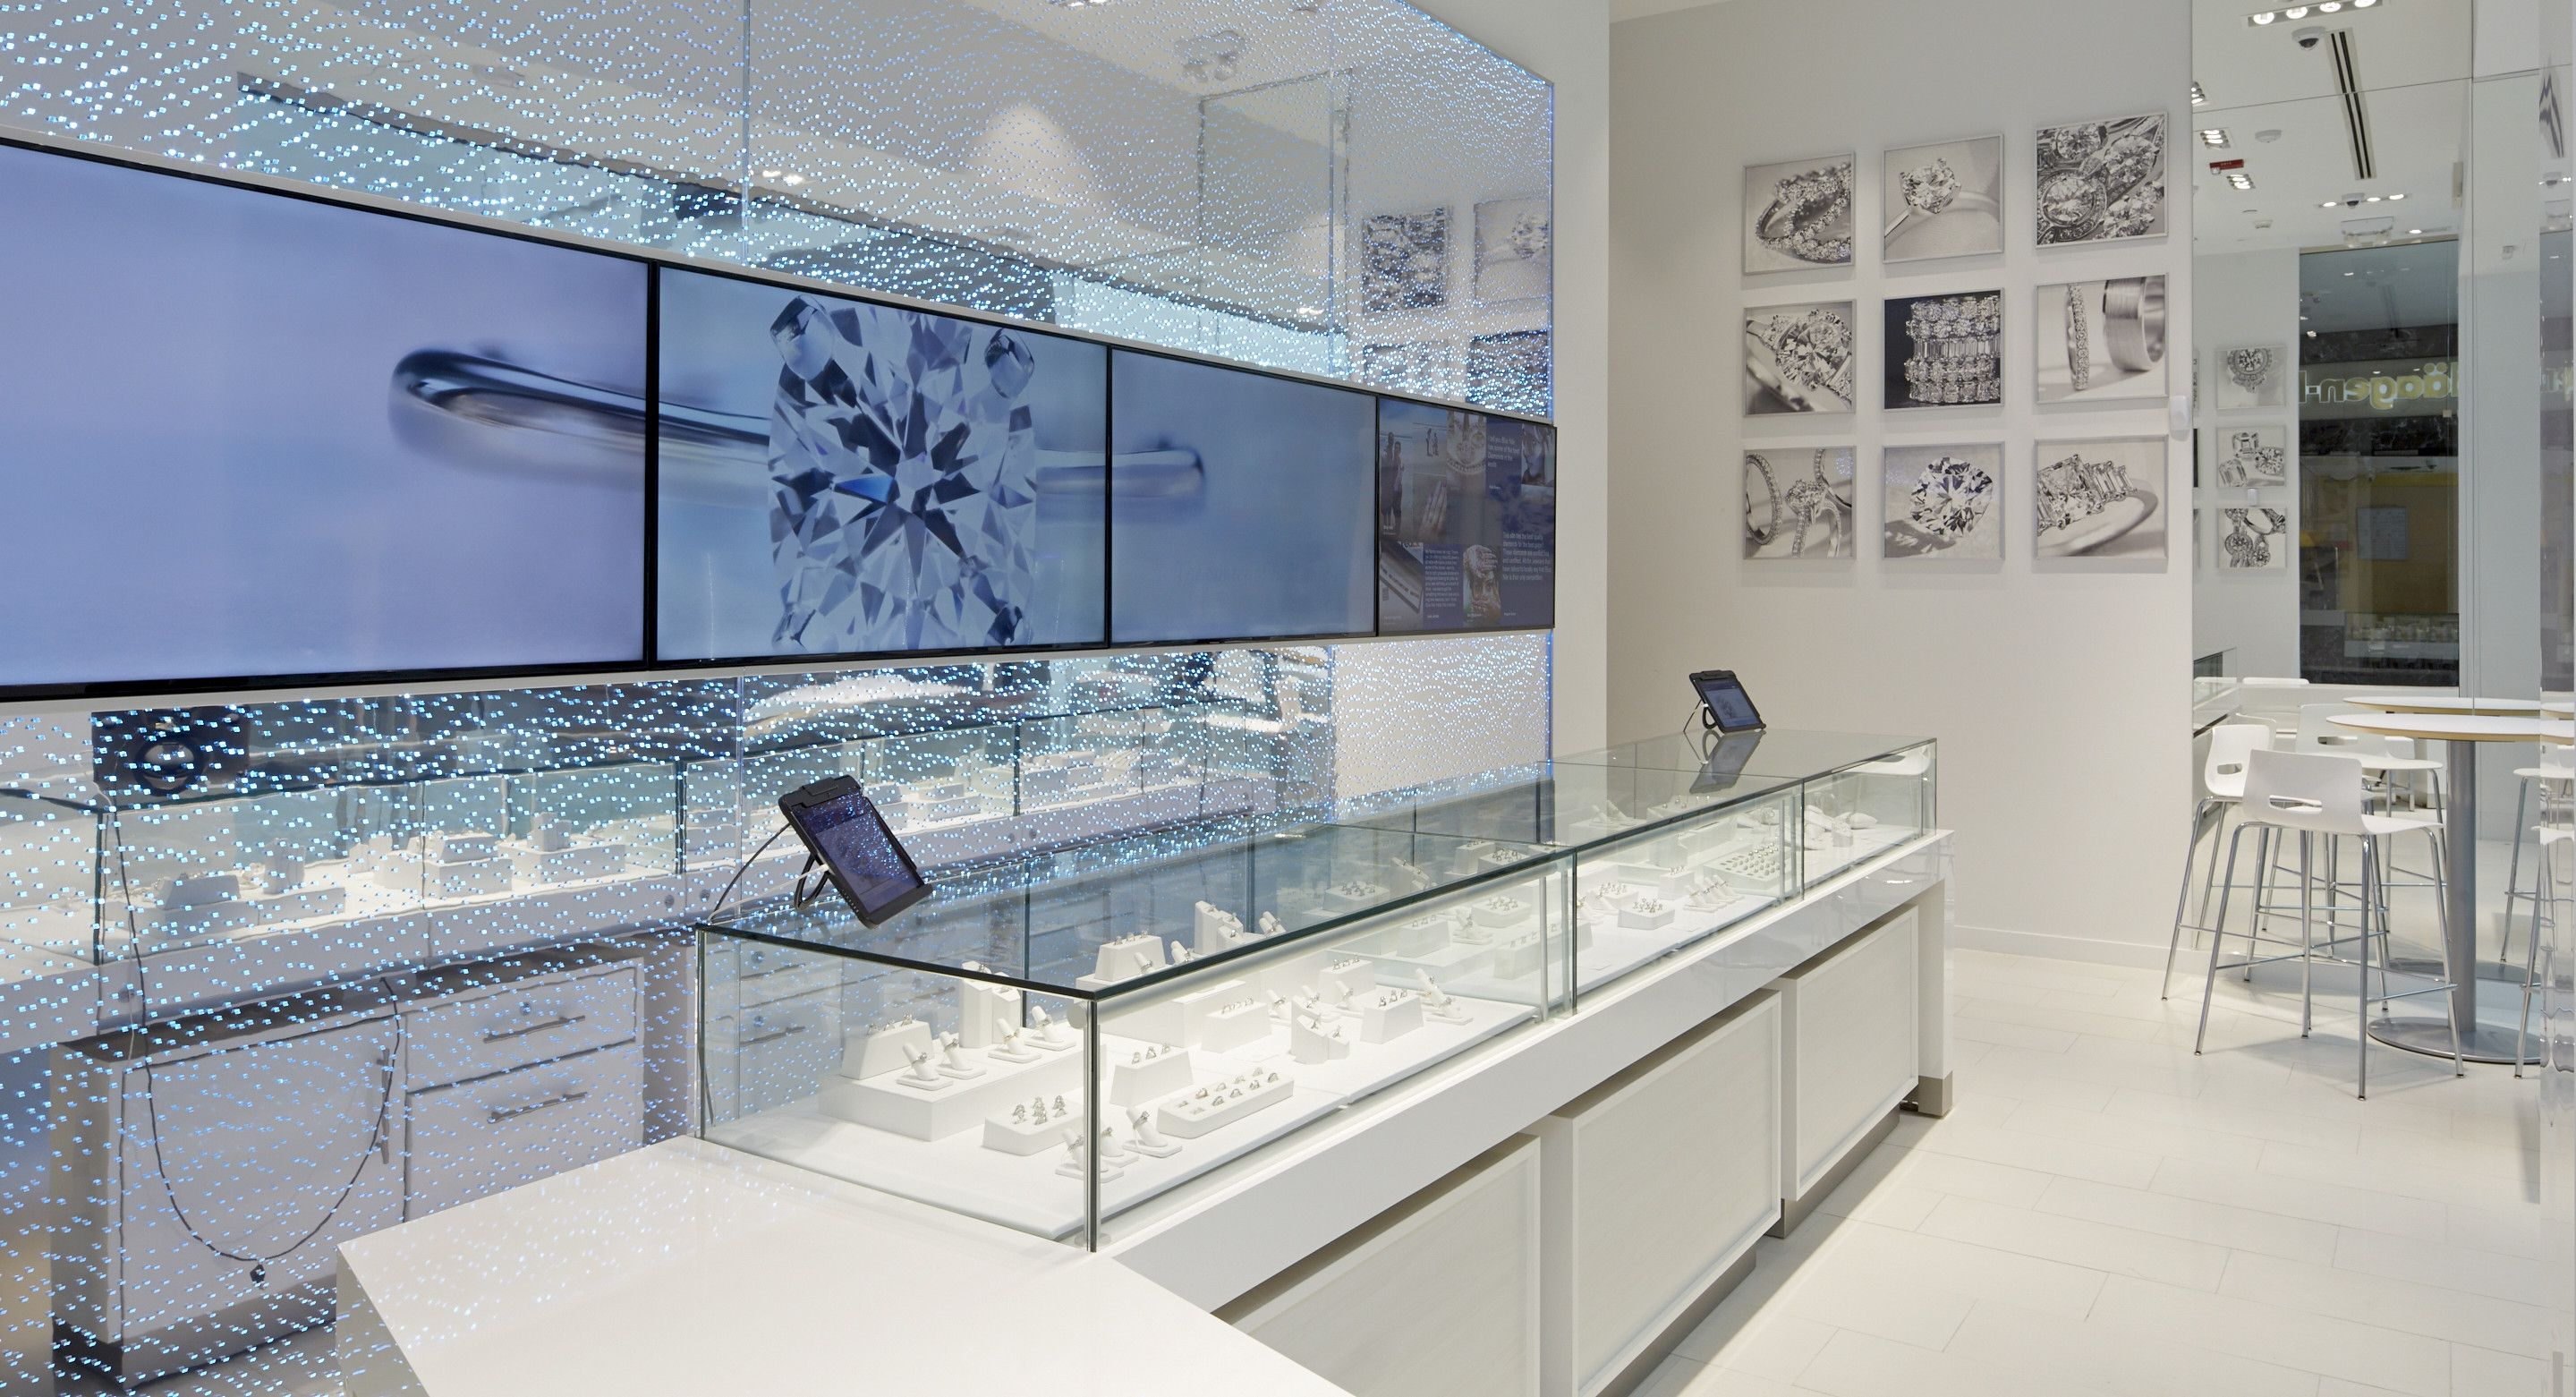 blue nile store - Google Search | Retail | Pinterest | Blue nile